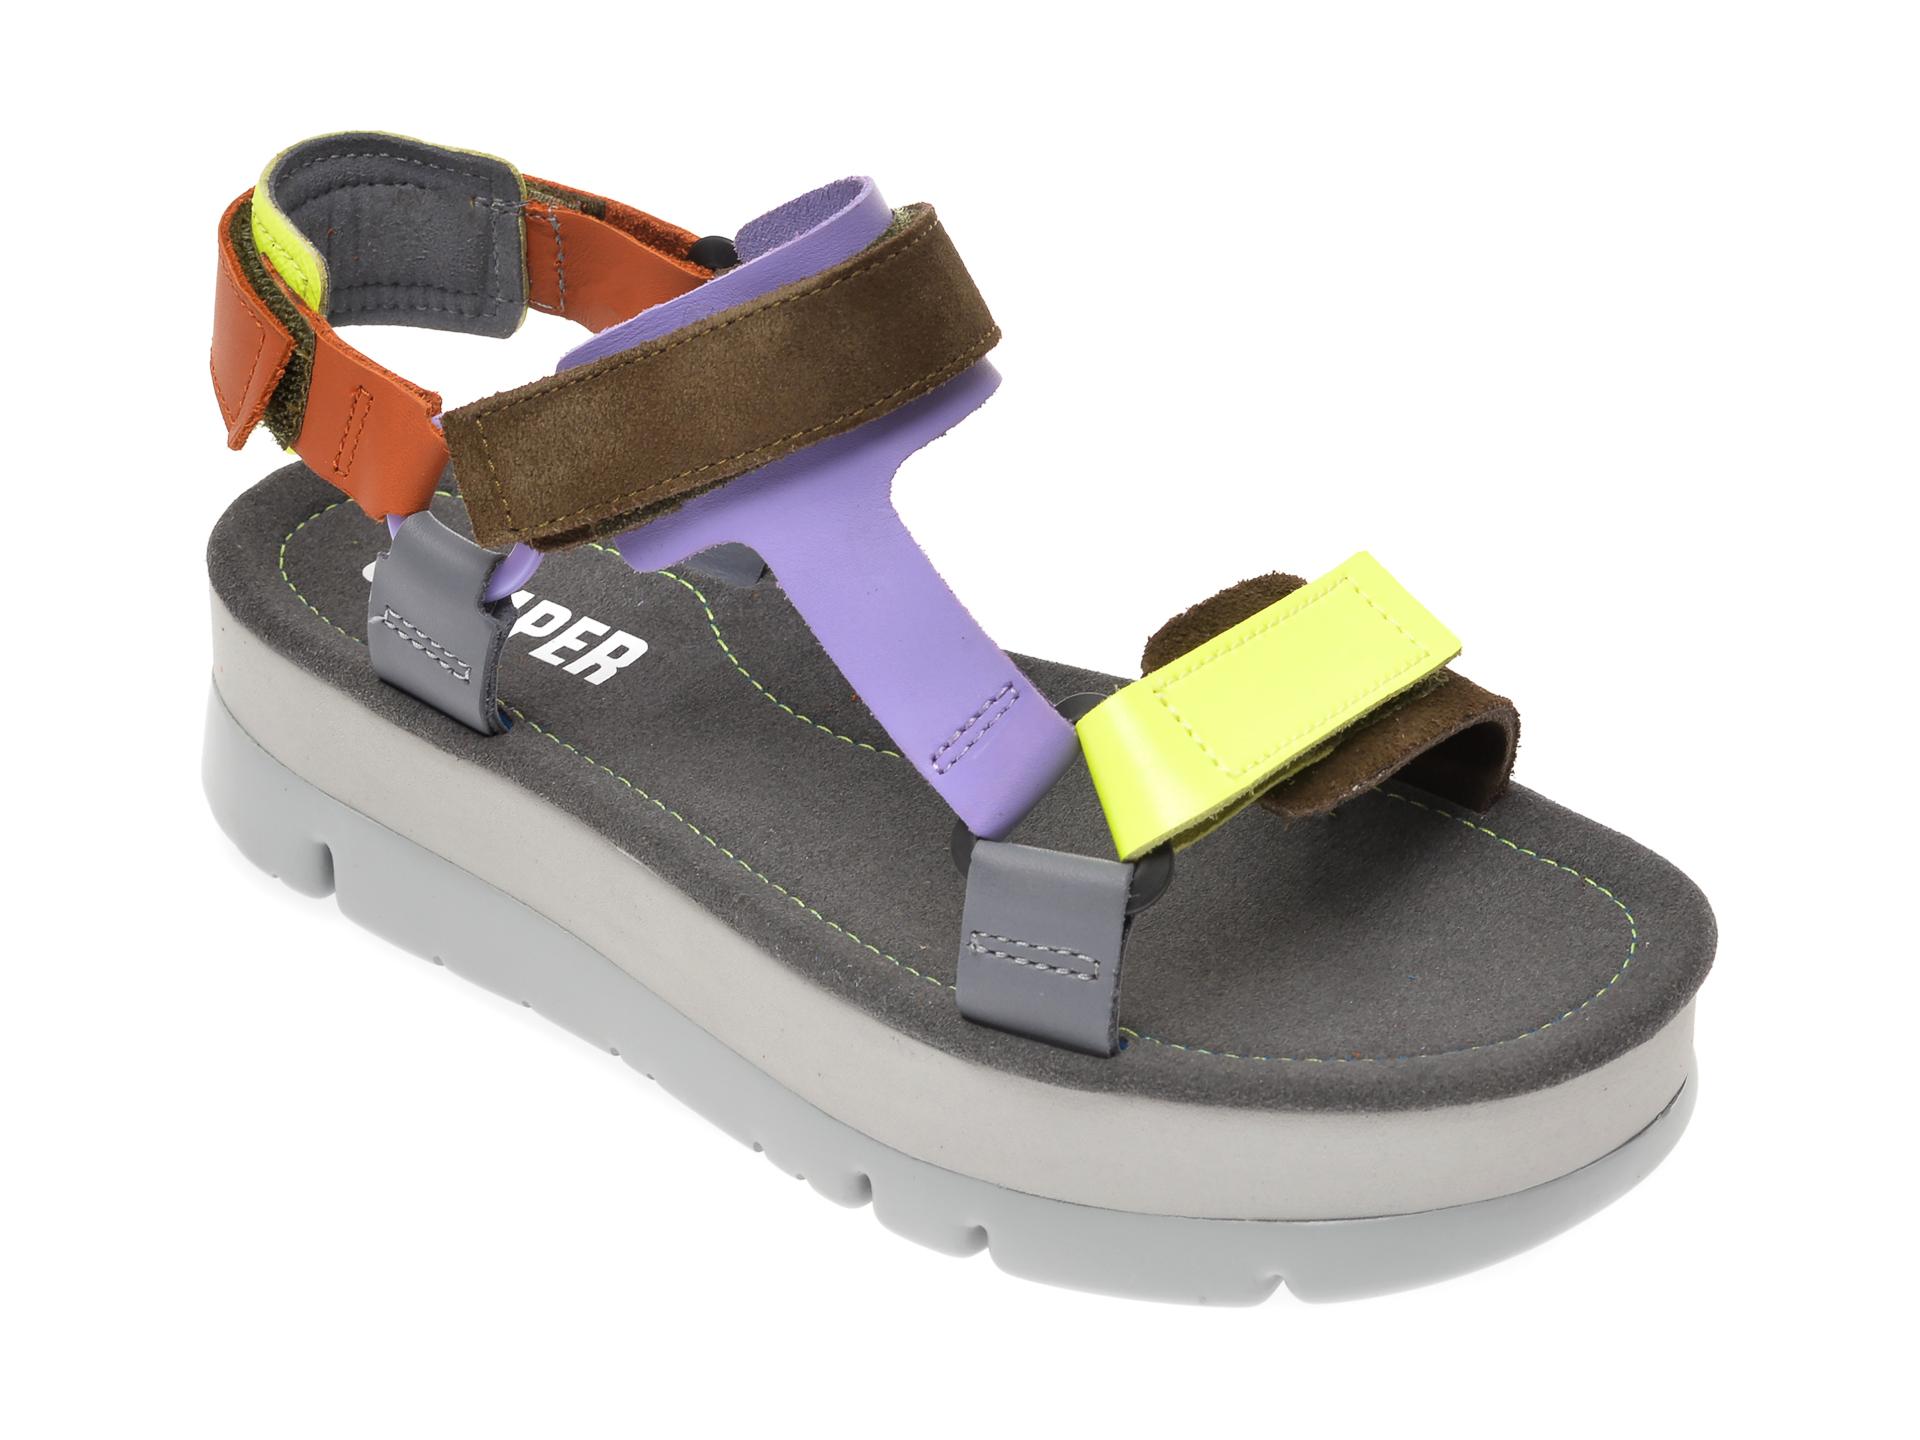 Sandale CAMPER multicolor, K201037, din piele naturala imagine